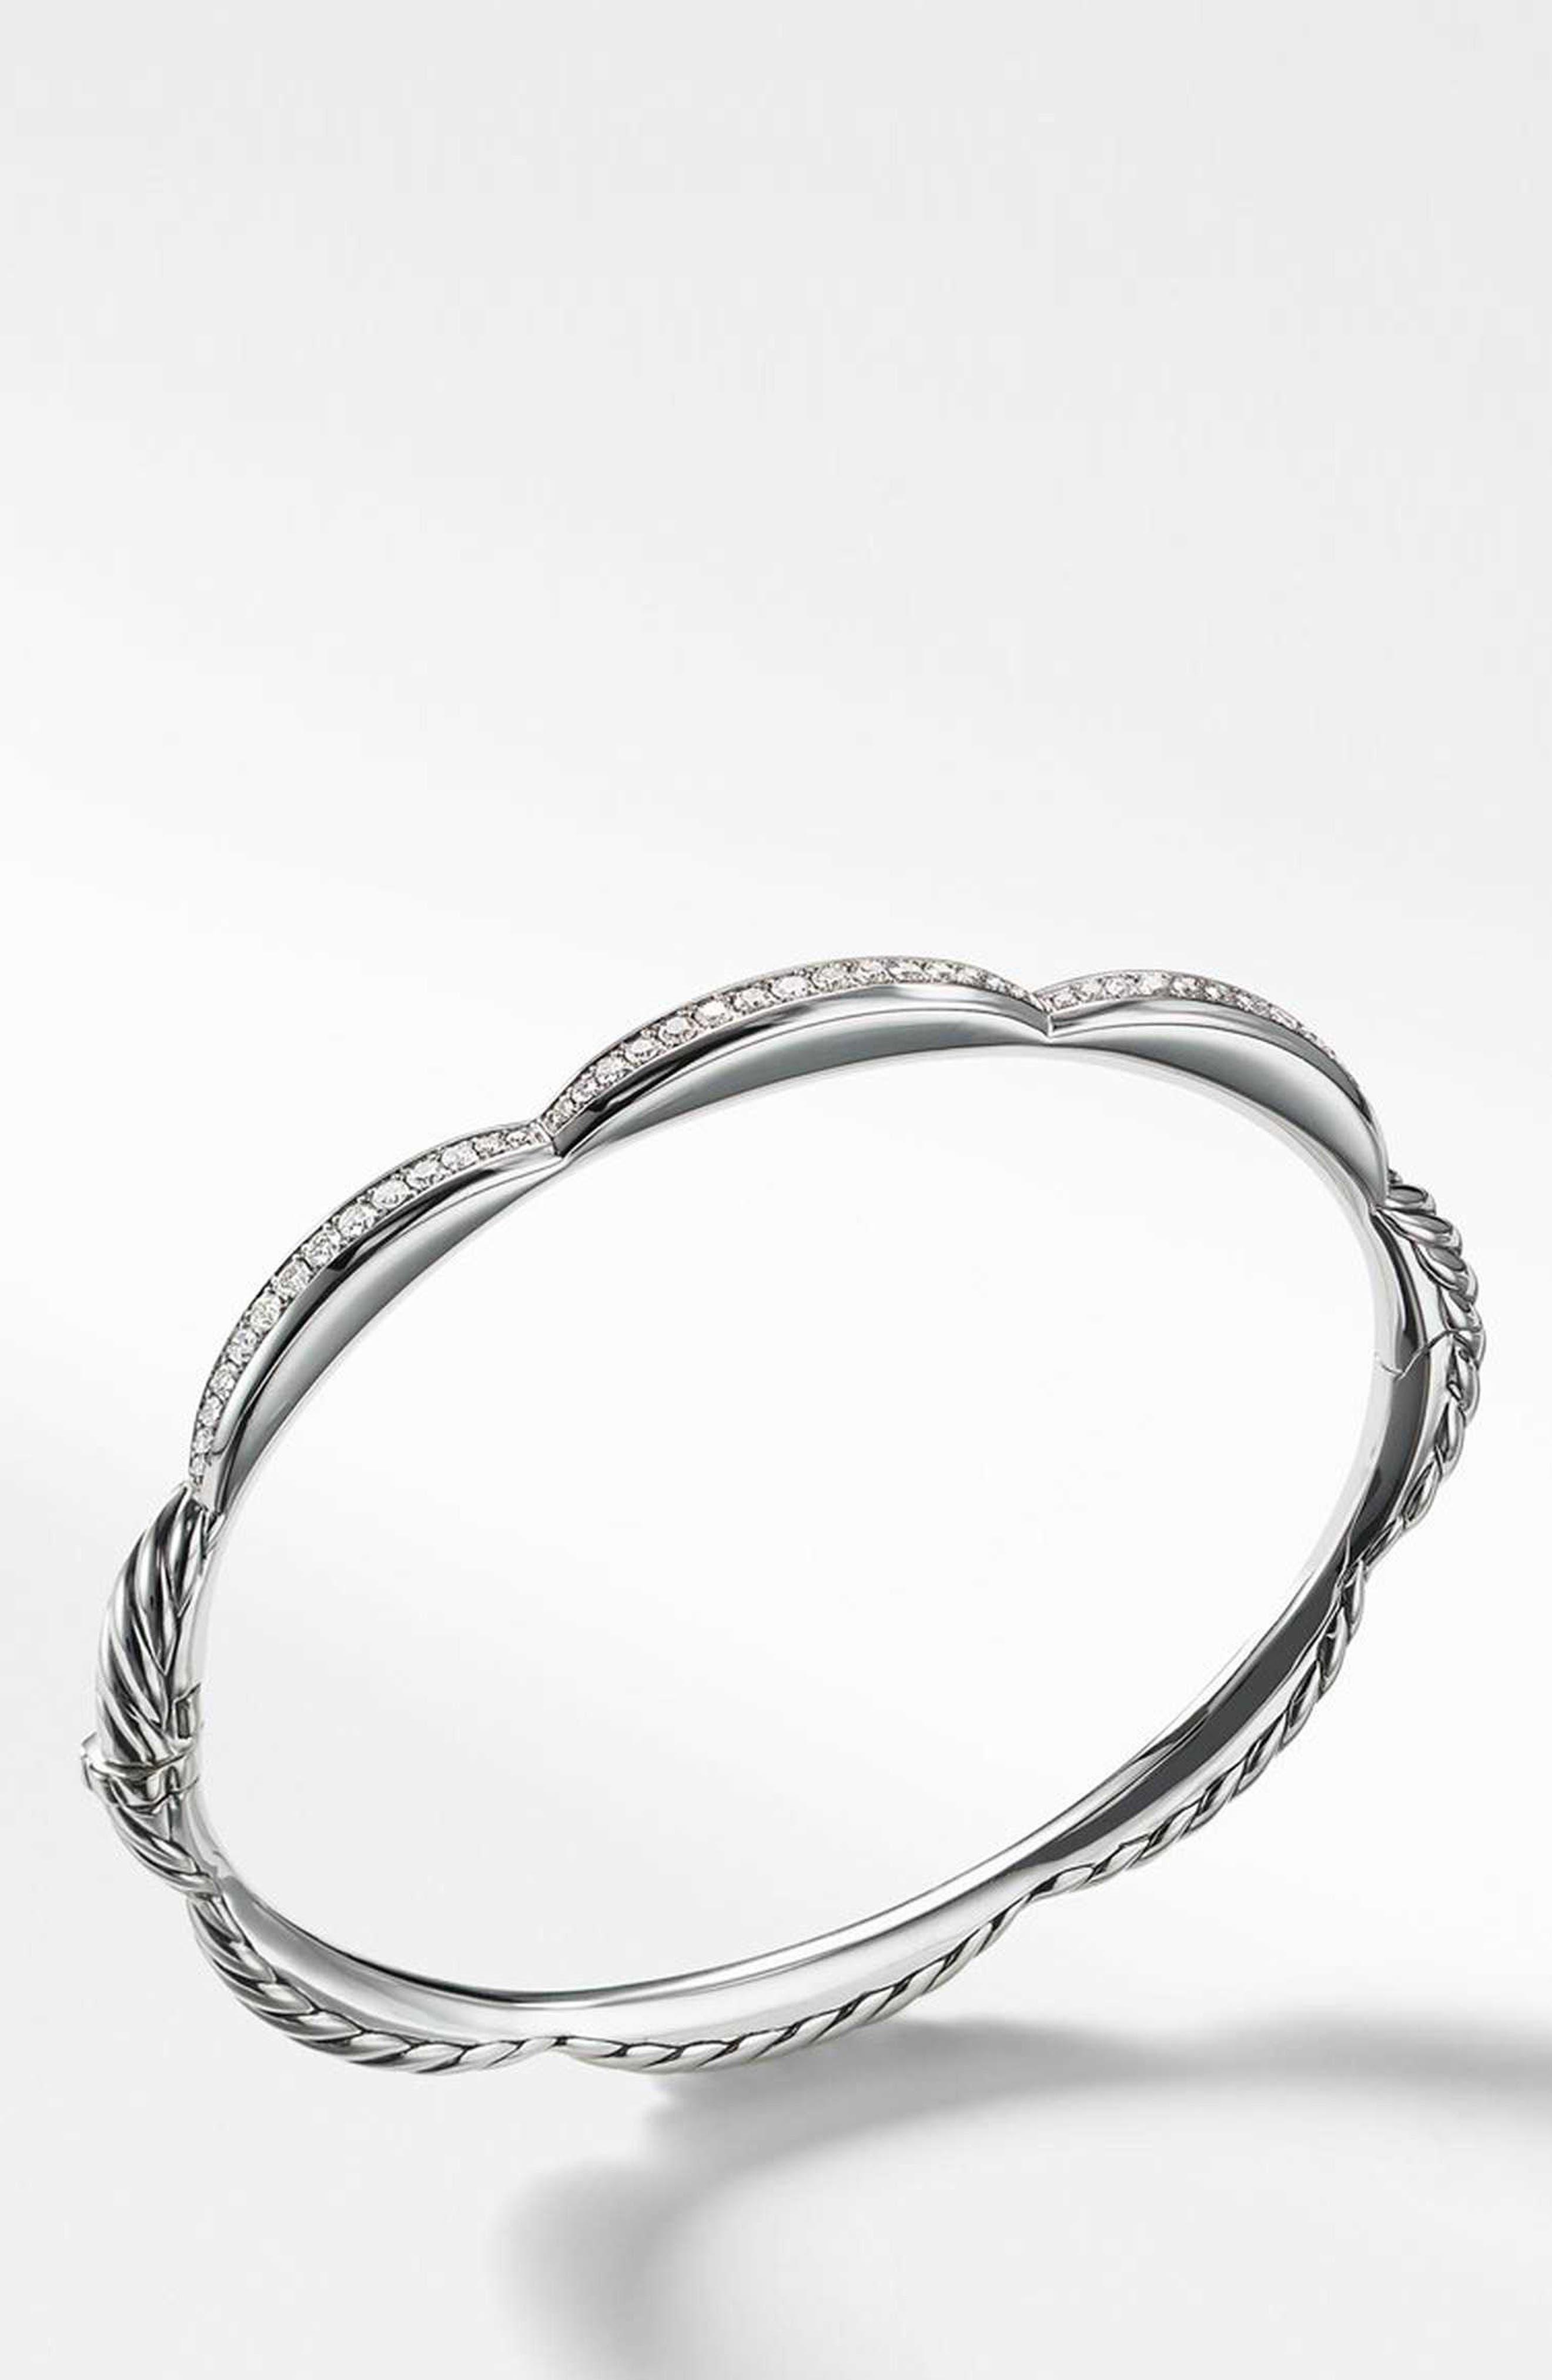 Tides 3-Station Bracelet with Diamonds,                             Alternate thumbnail 2, color,                             STERLING SILVER/ DIAMOND